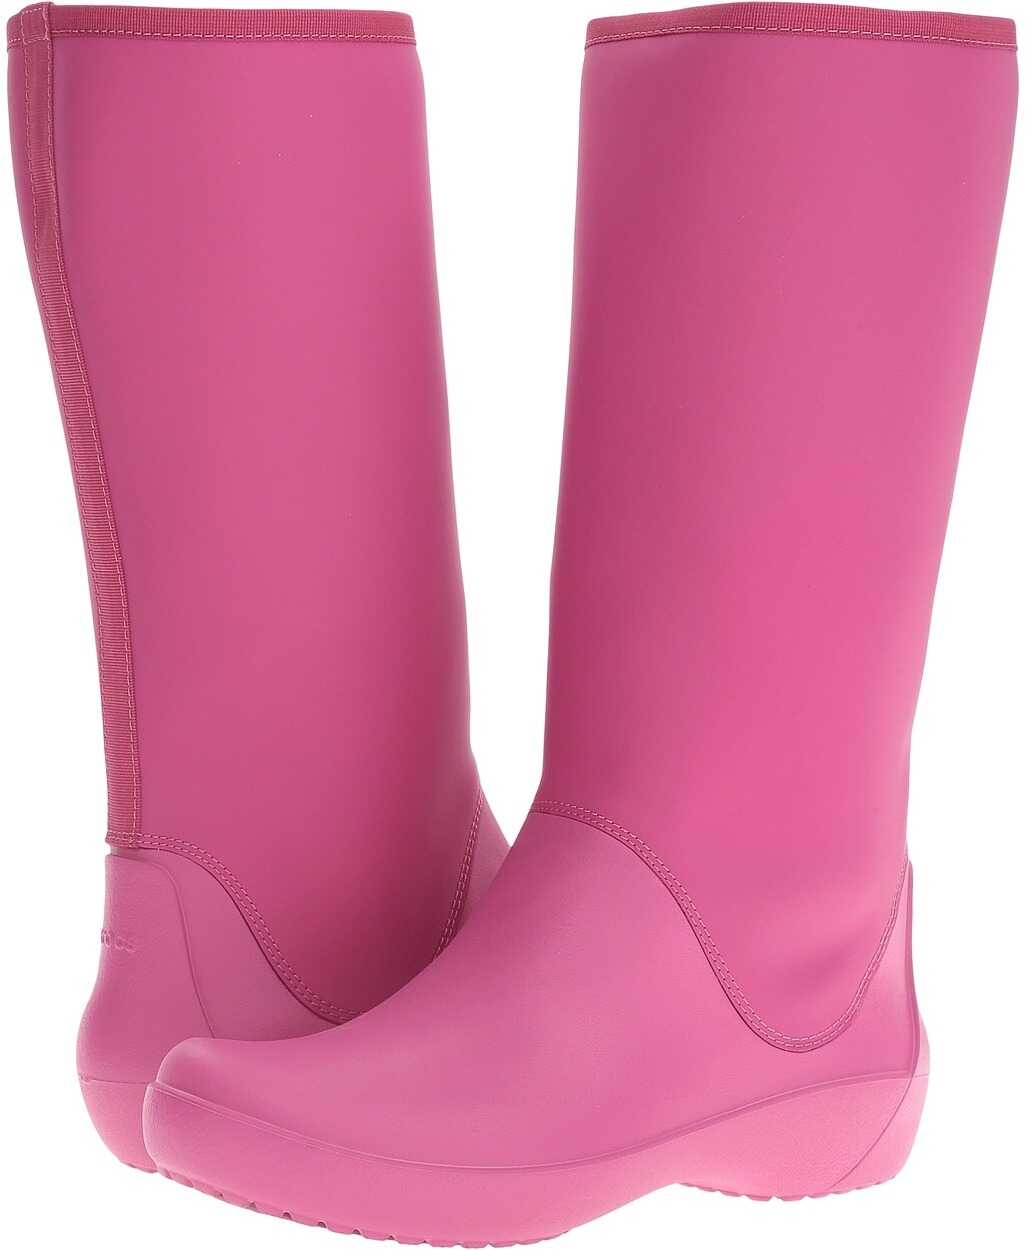 Crocs RainFloe Tall Boot Berry